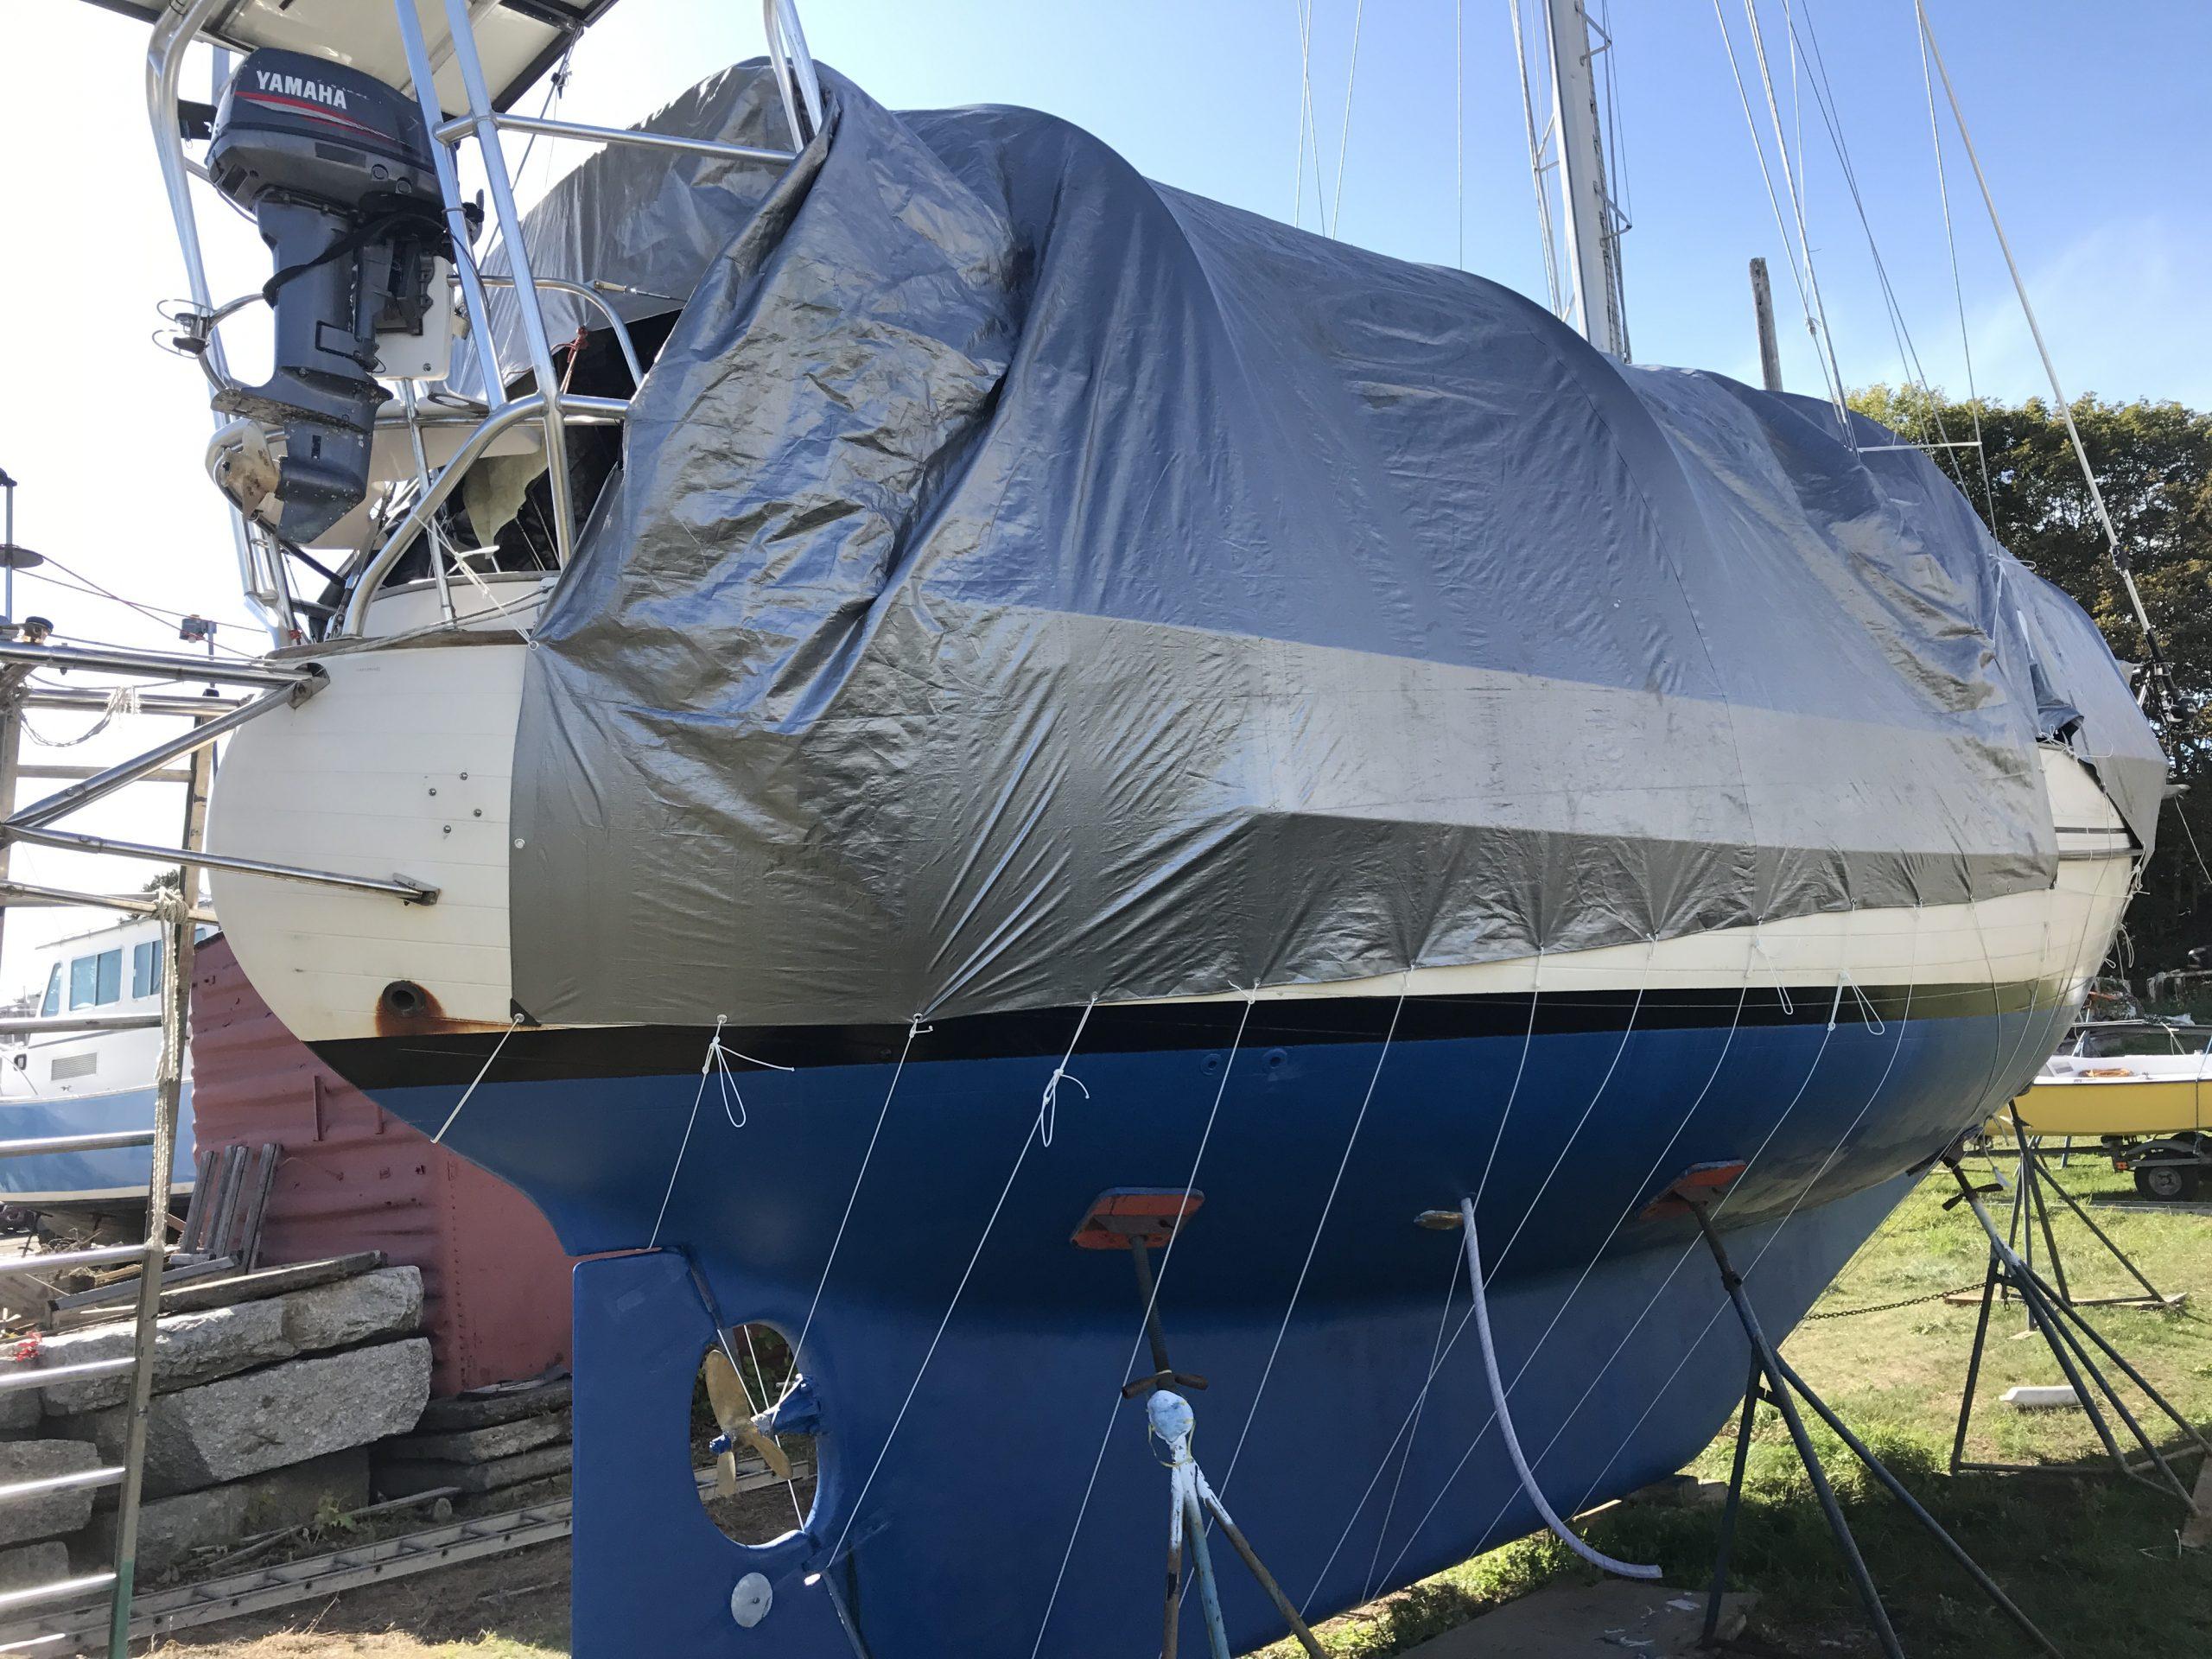 sailboat on the hard